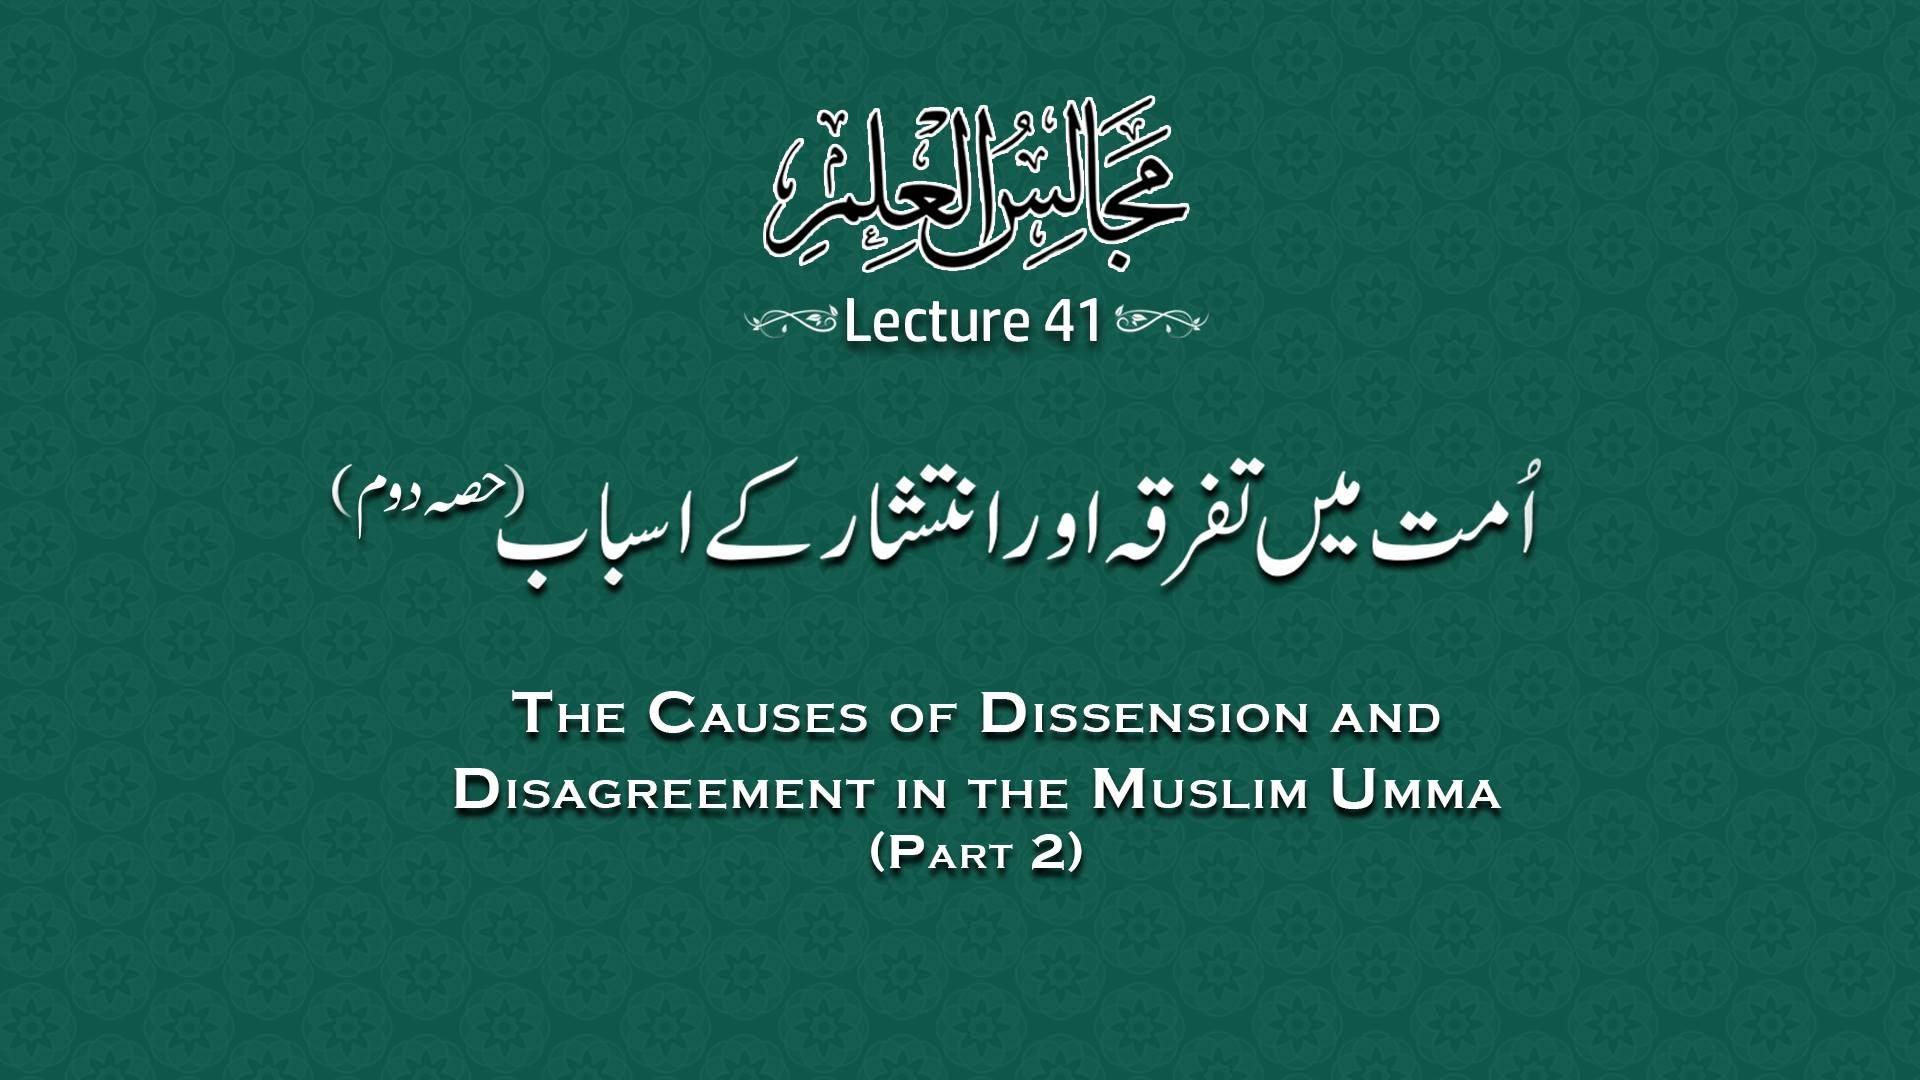 مجالس العلم (لیکچر 41) شیخ الاسلام ڈاکٹر محمد طاہرالقادری